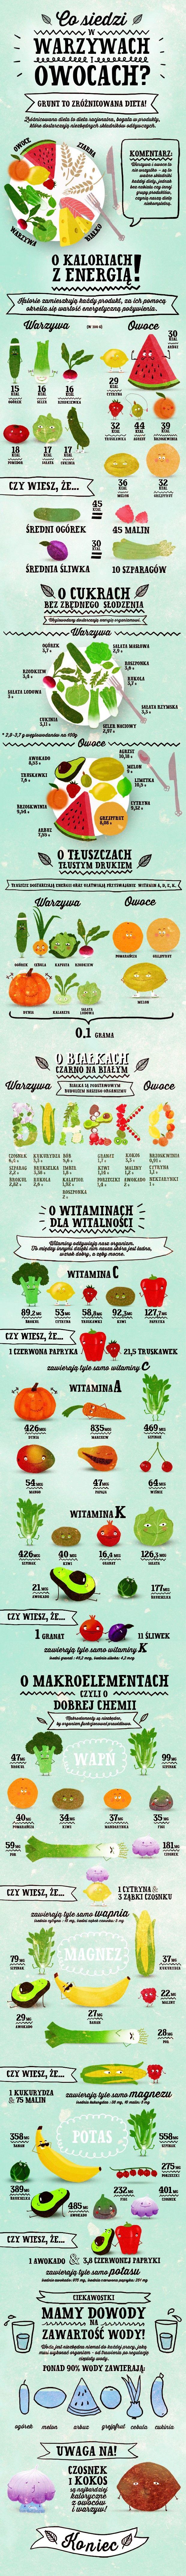 inofgrafika warzywa i owoce